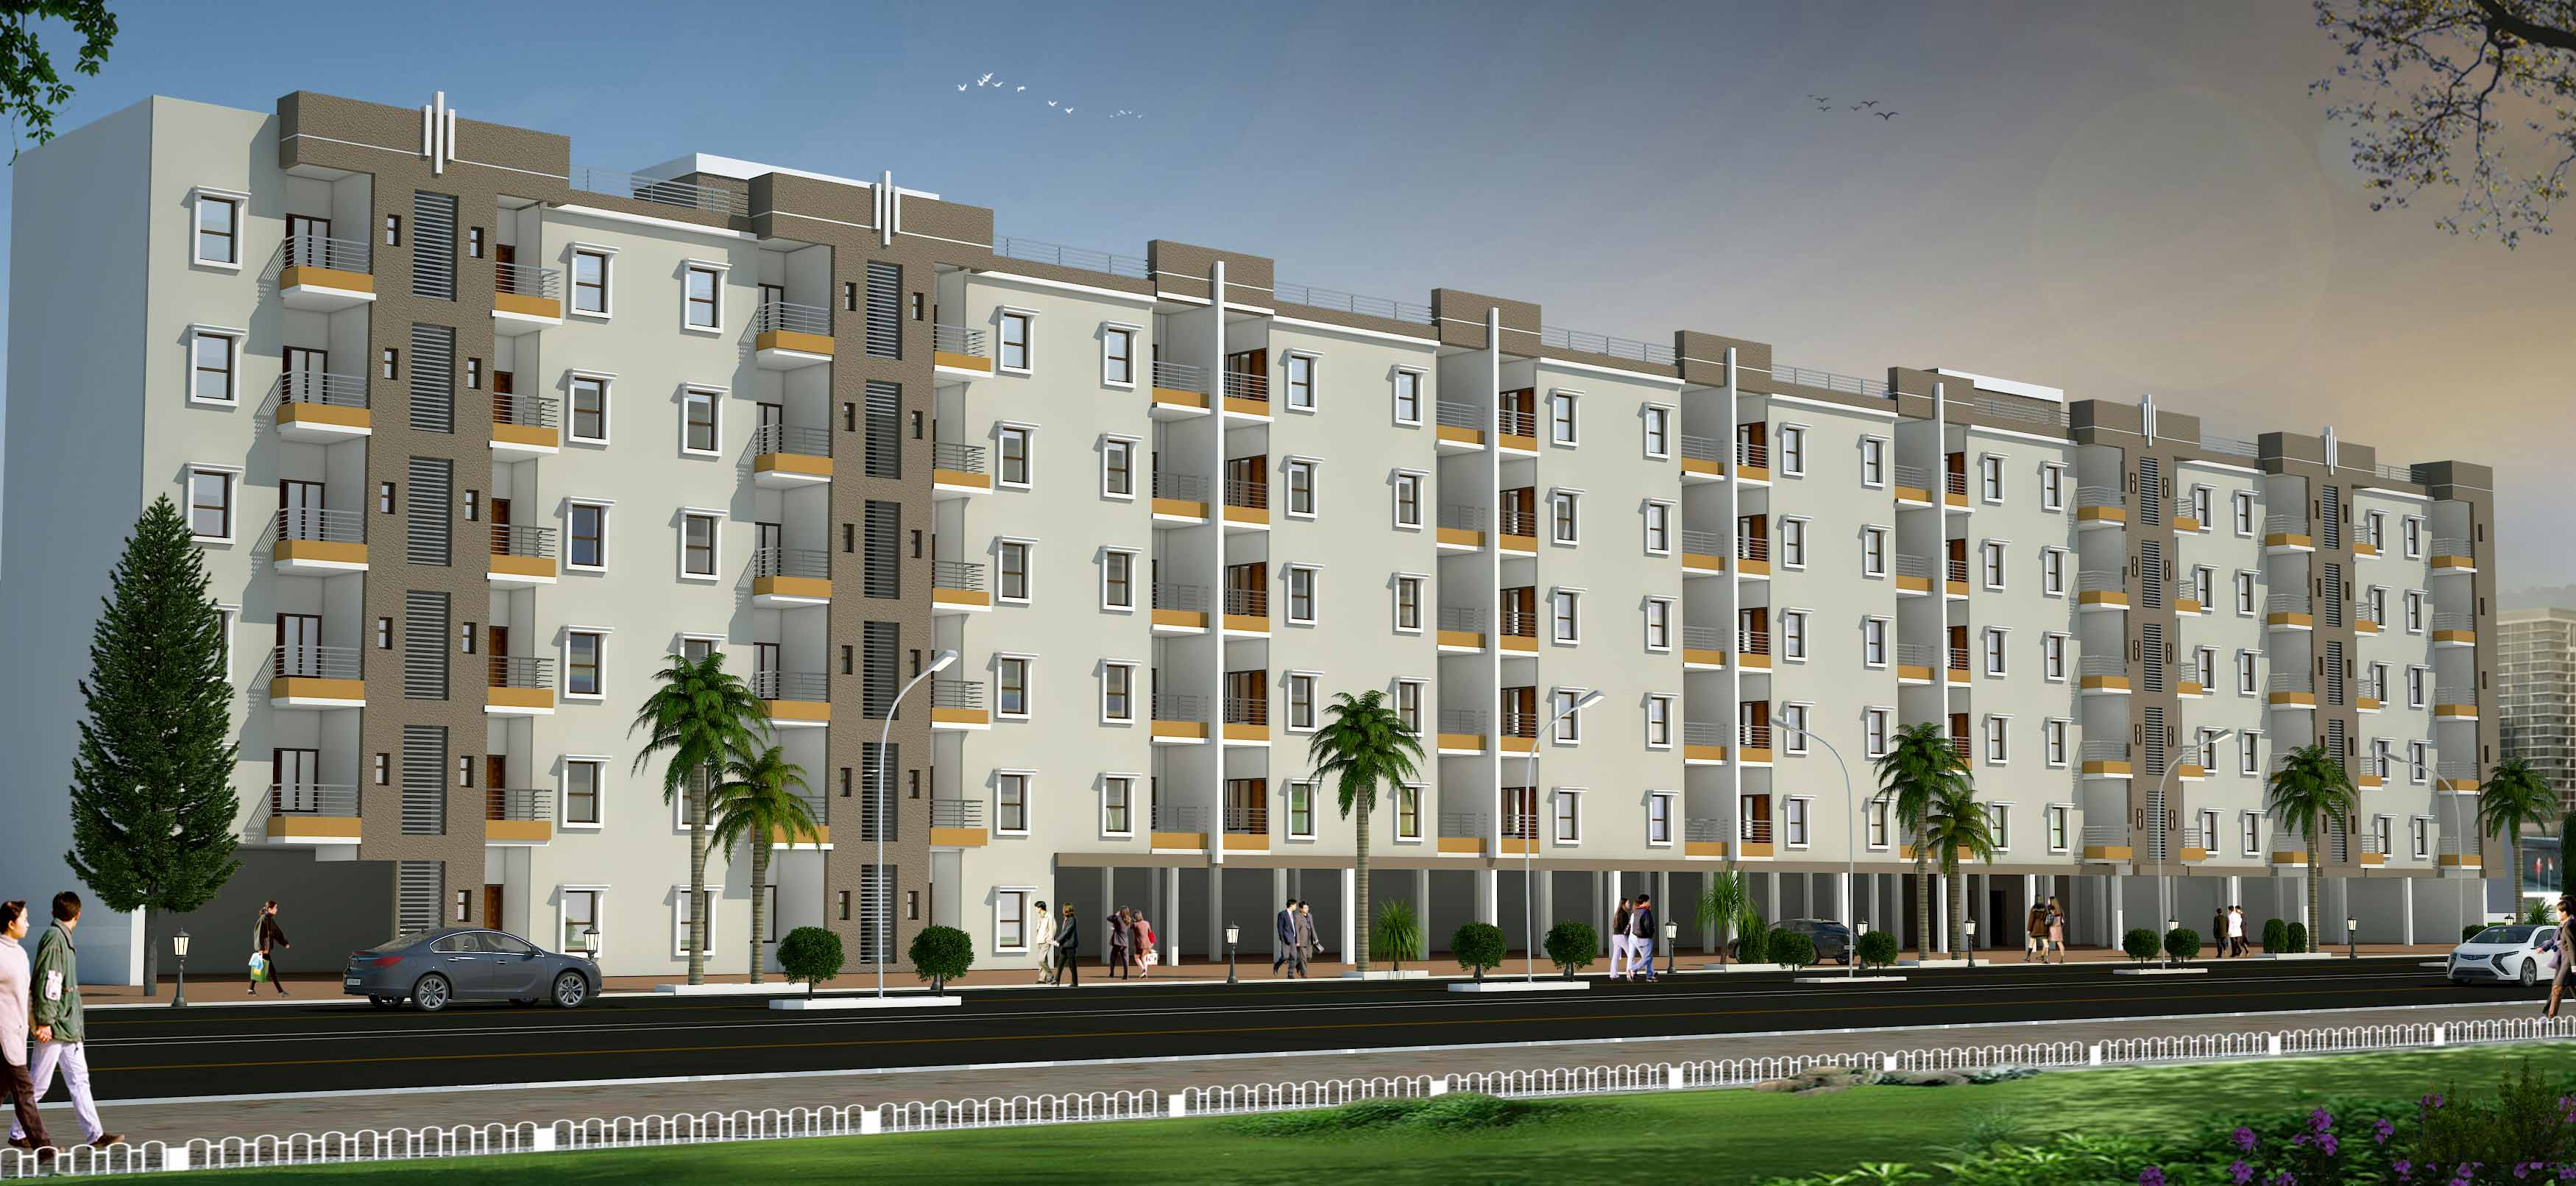 Rama Krishna Heights - VRINDAVAN, UP